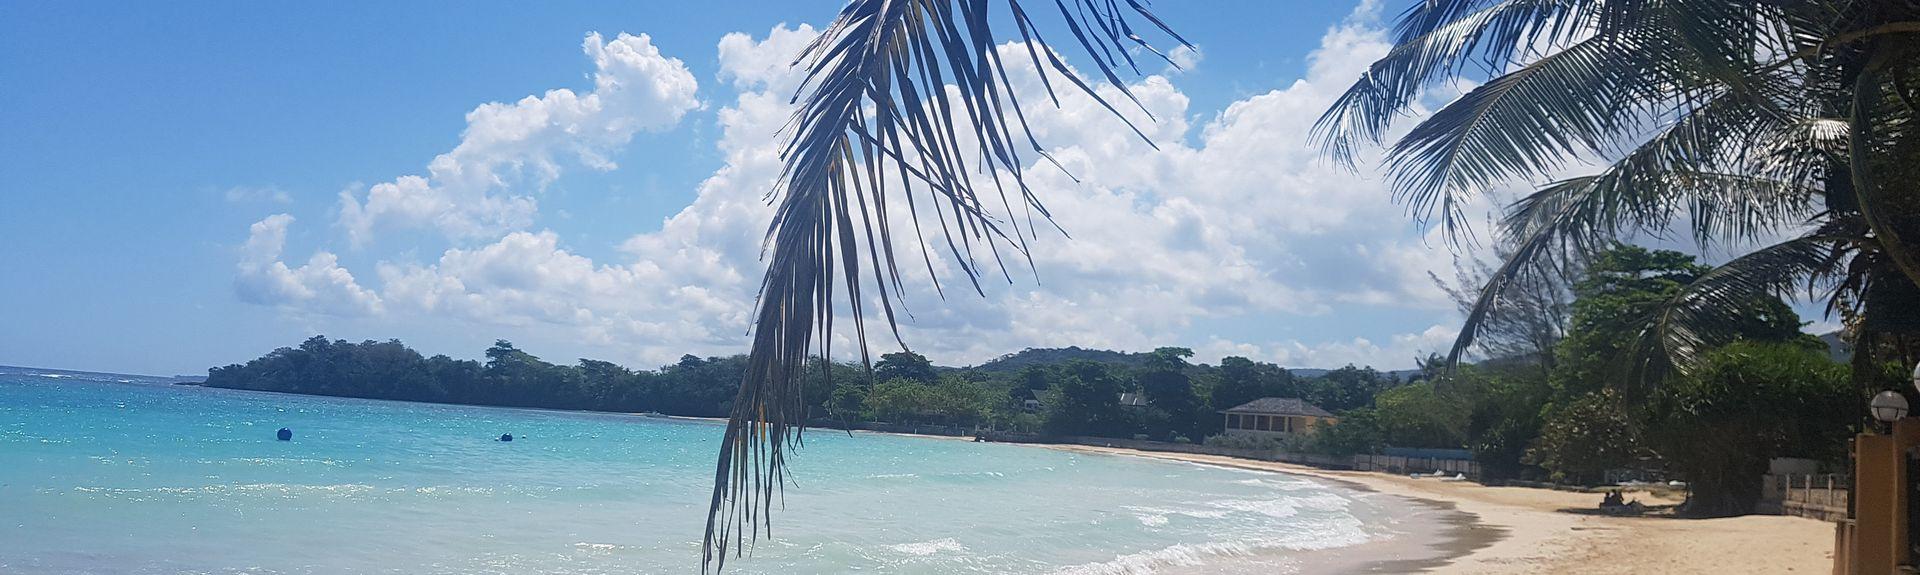 Mammee Bay Estates Vacation Als